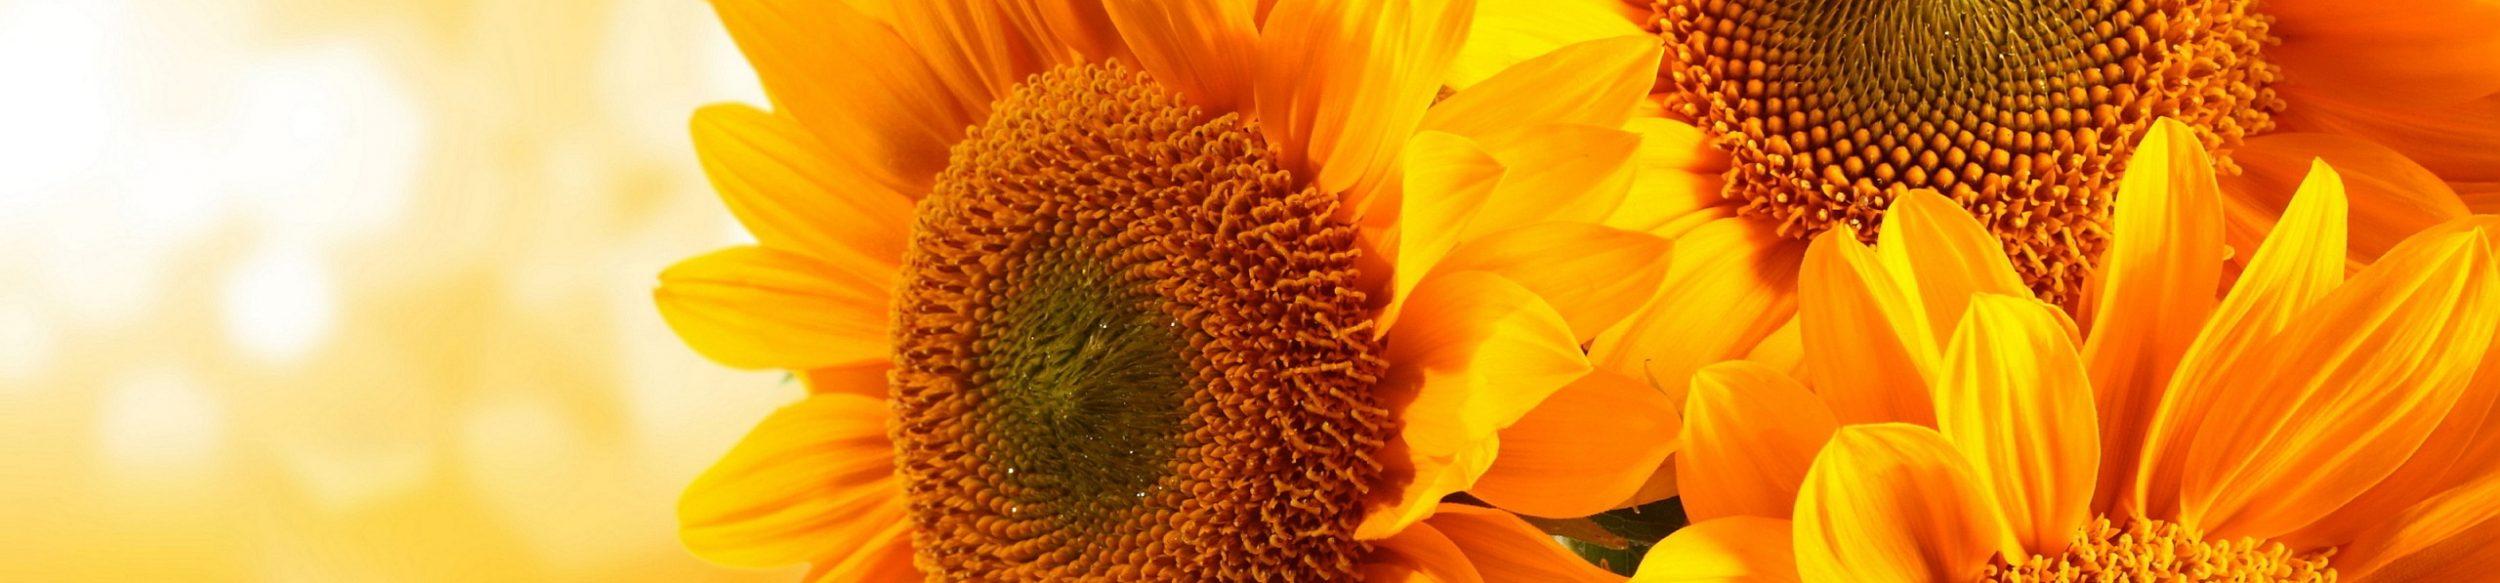 Kwiaciarnia Helianthus Gliwice, ul. Jasna 14A/60